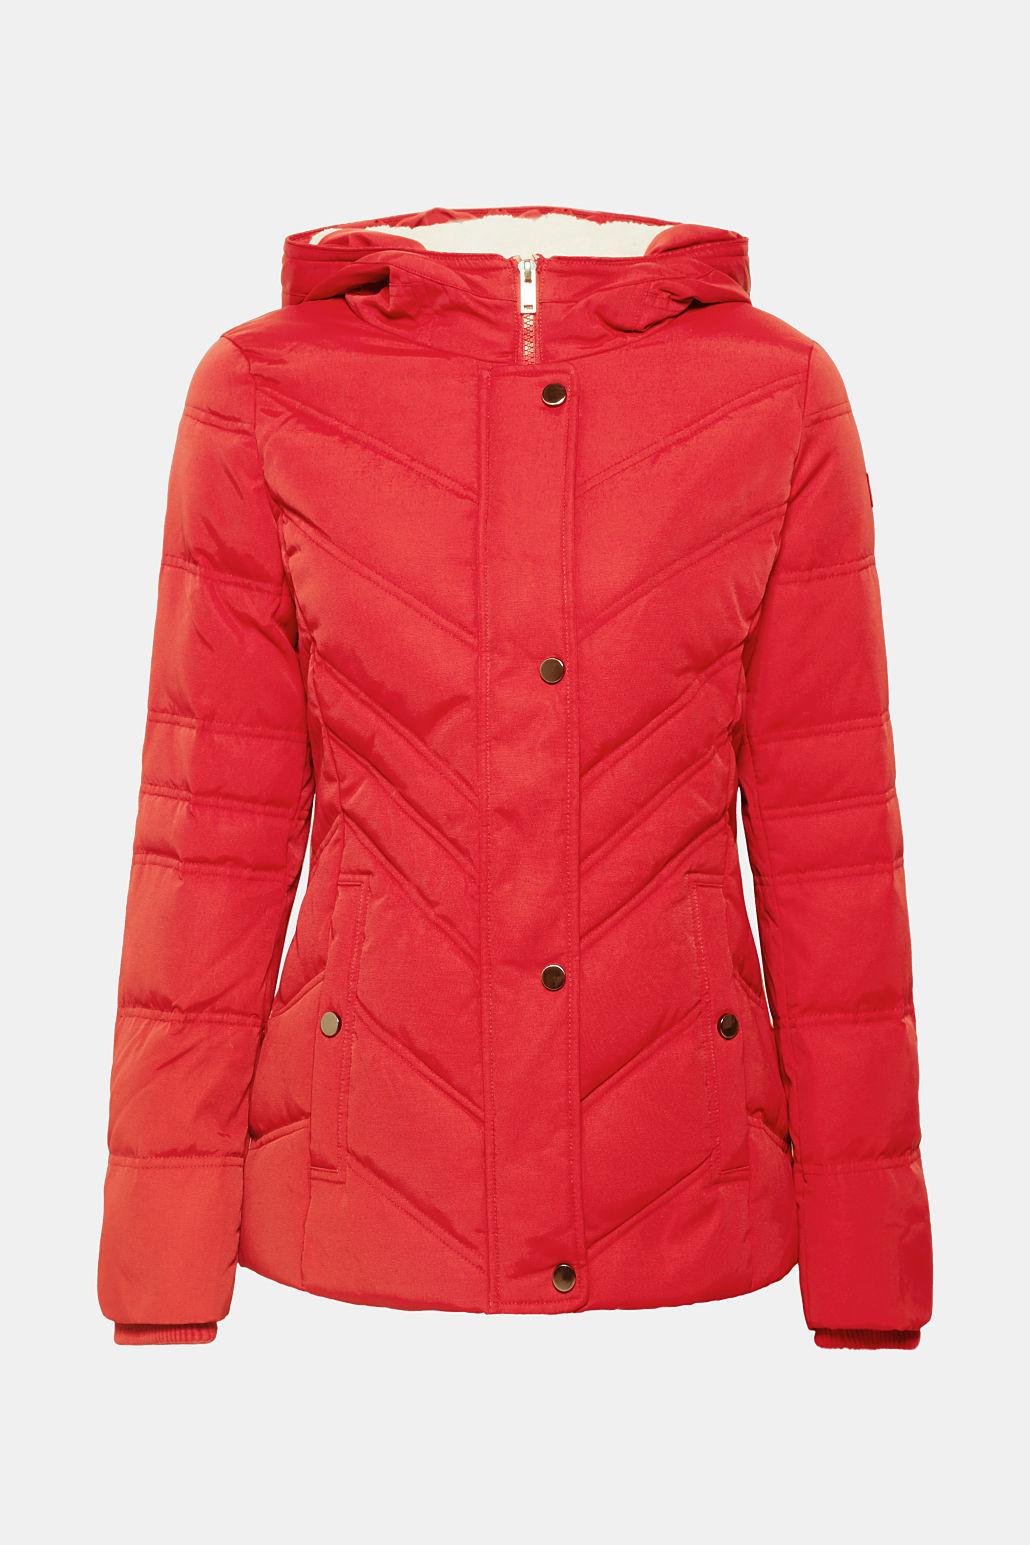 Esprit Women S Teddy Fur Lined Hood Padded Jacket Coats Jackets